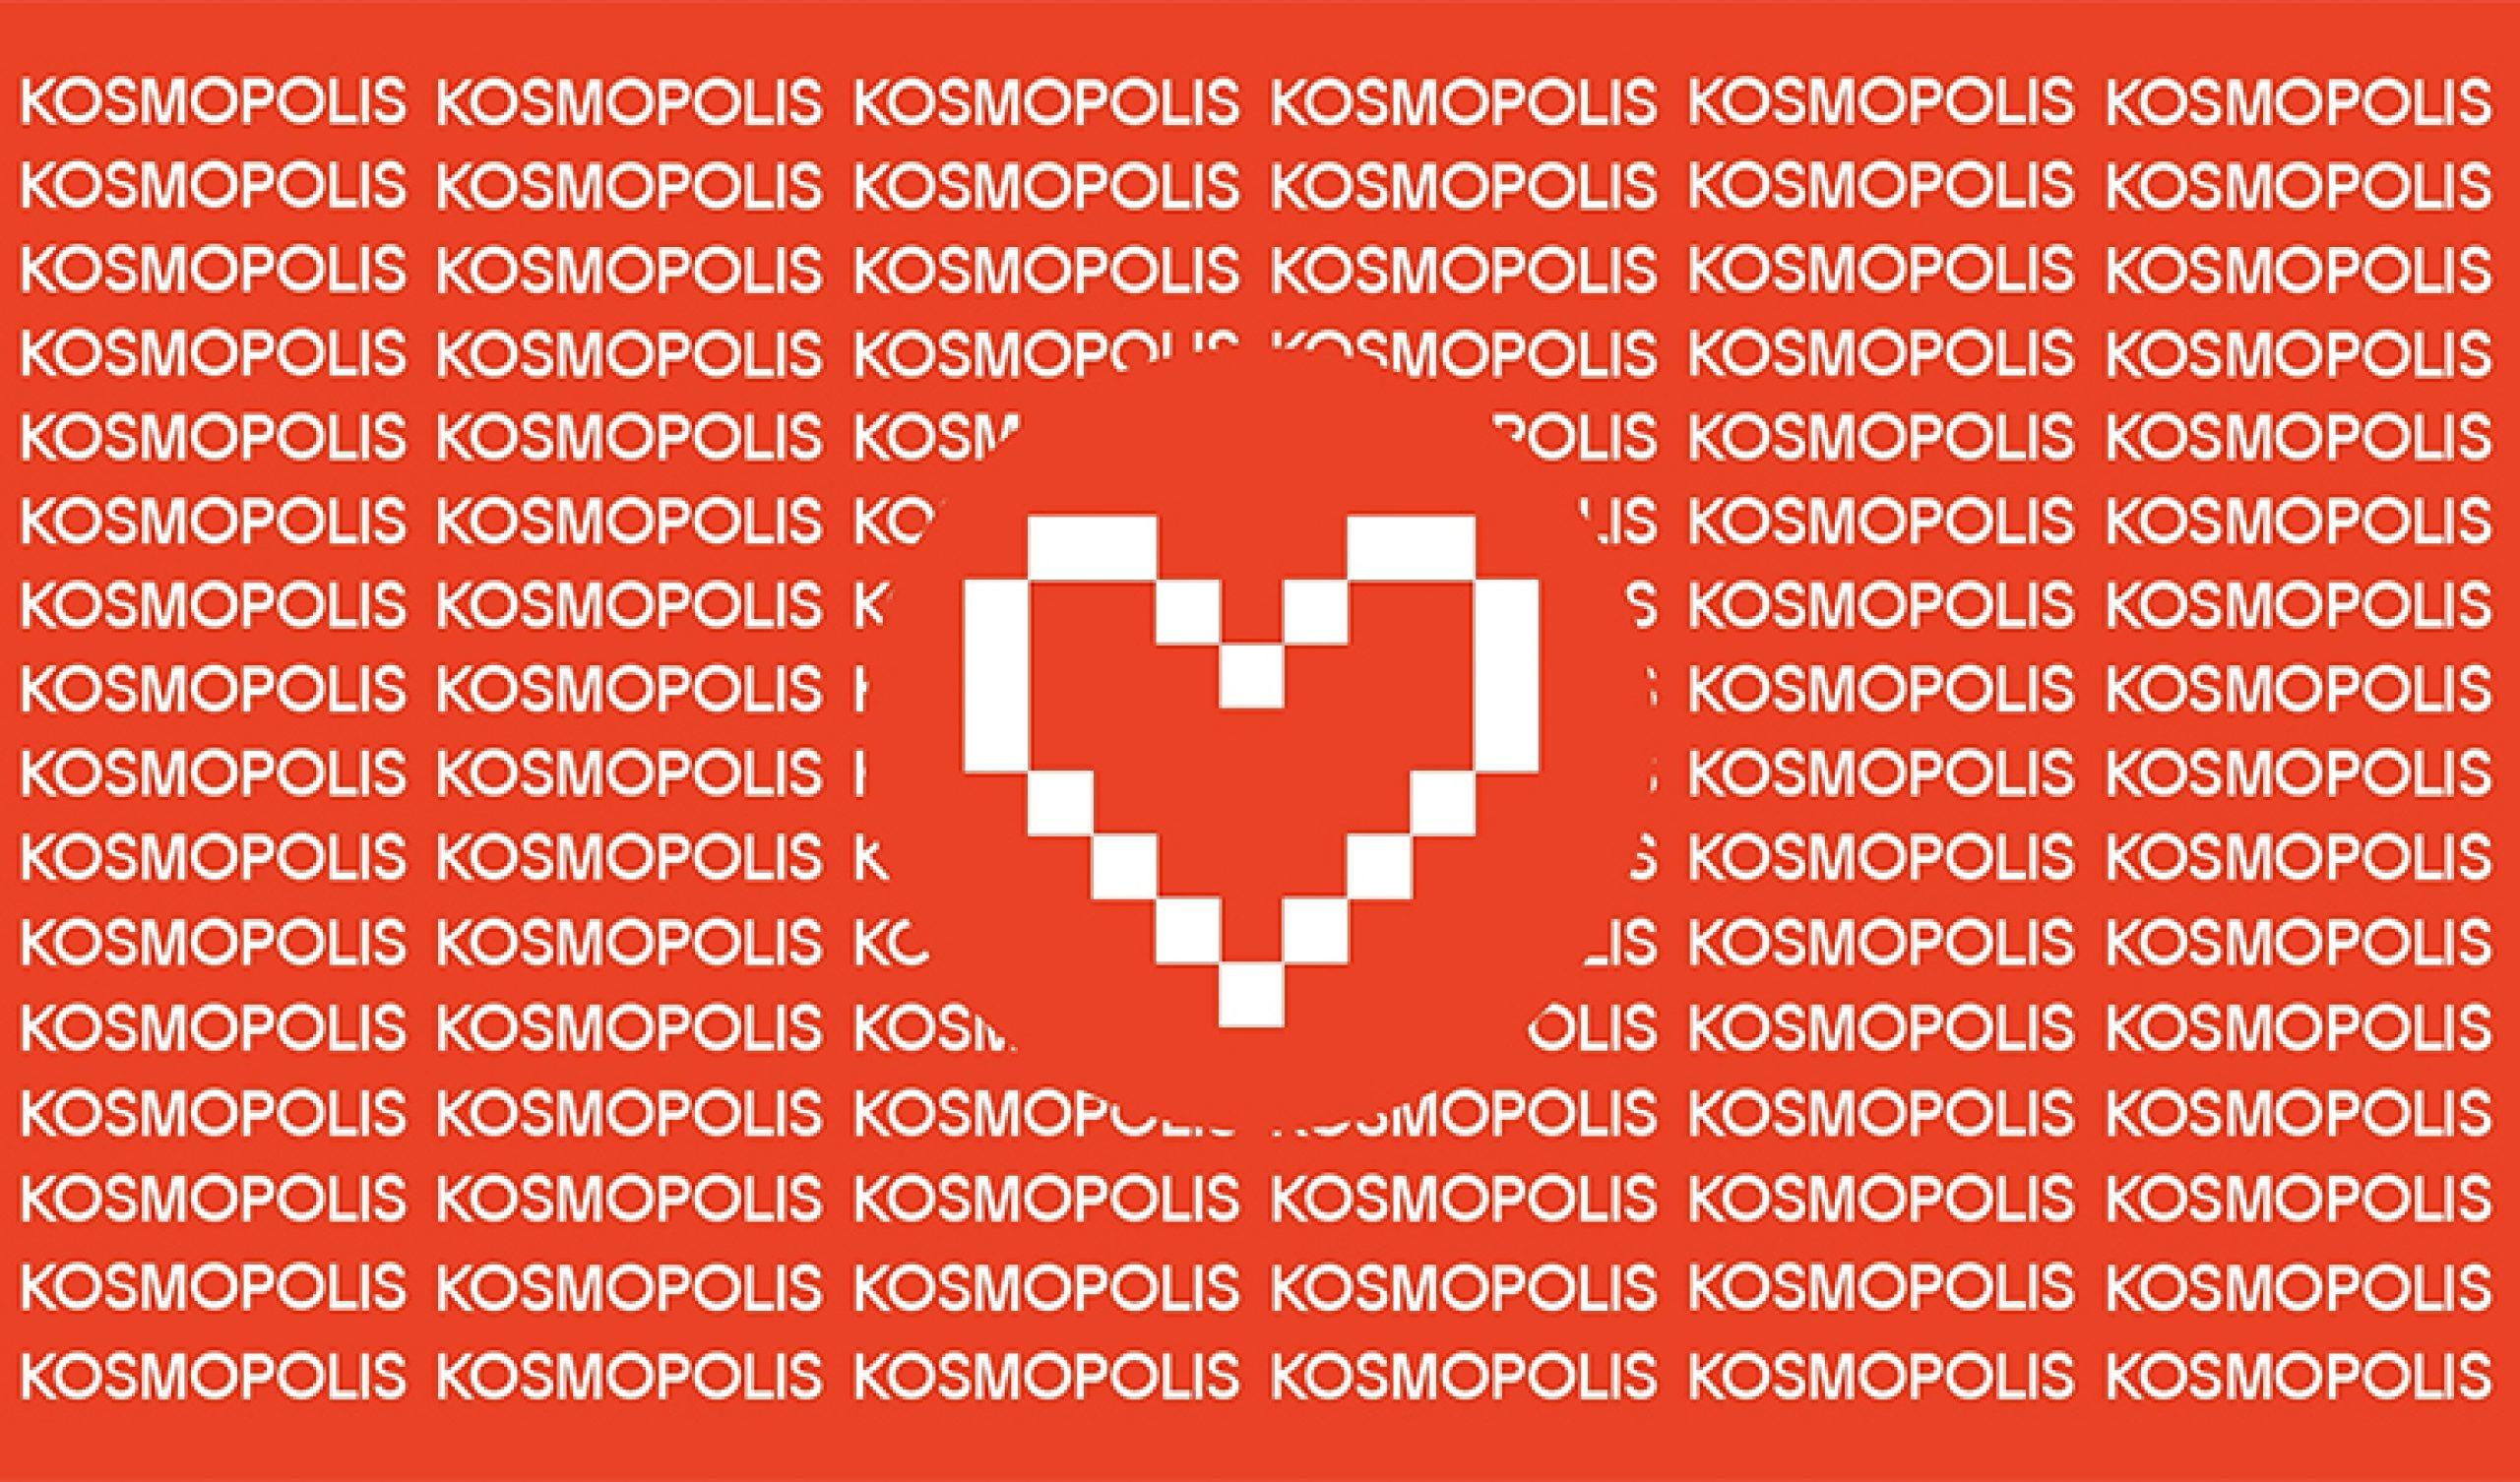 Kosmopolis_HORIZONTAL_LAKASETA